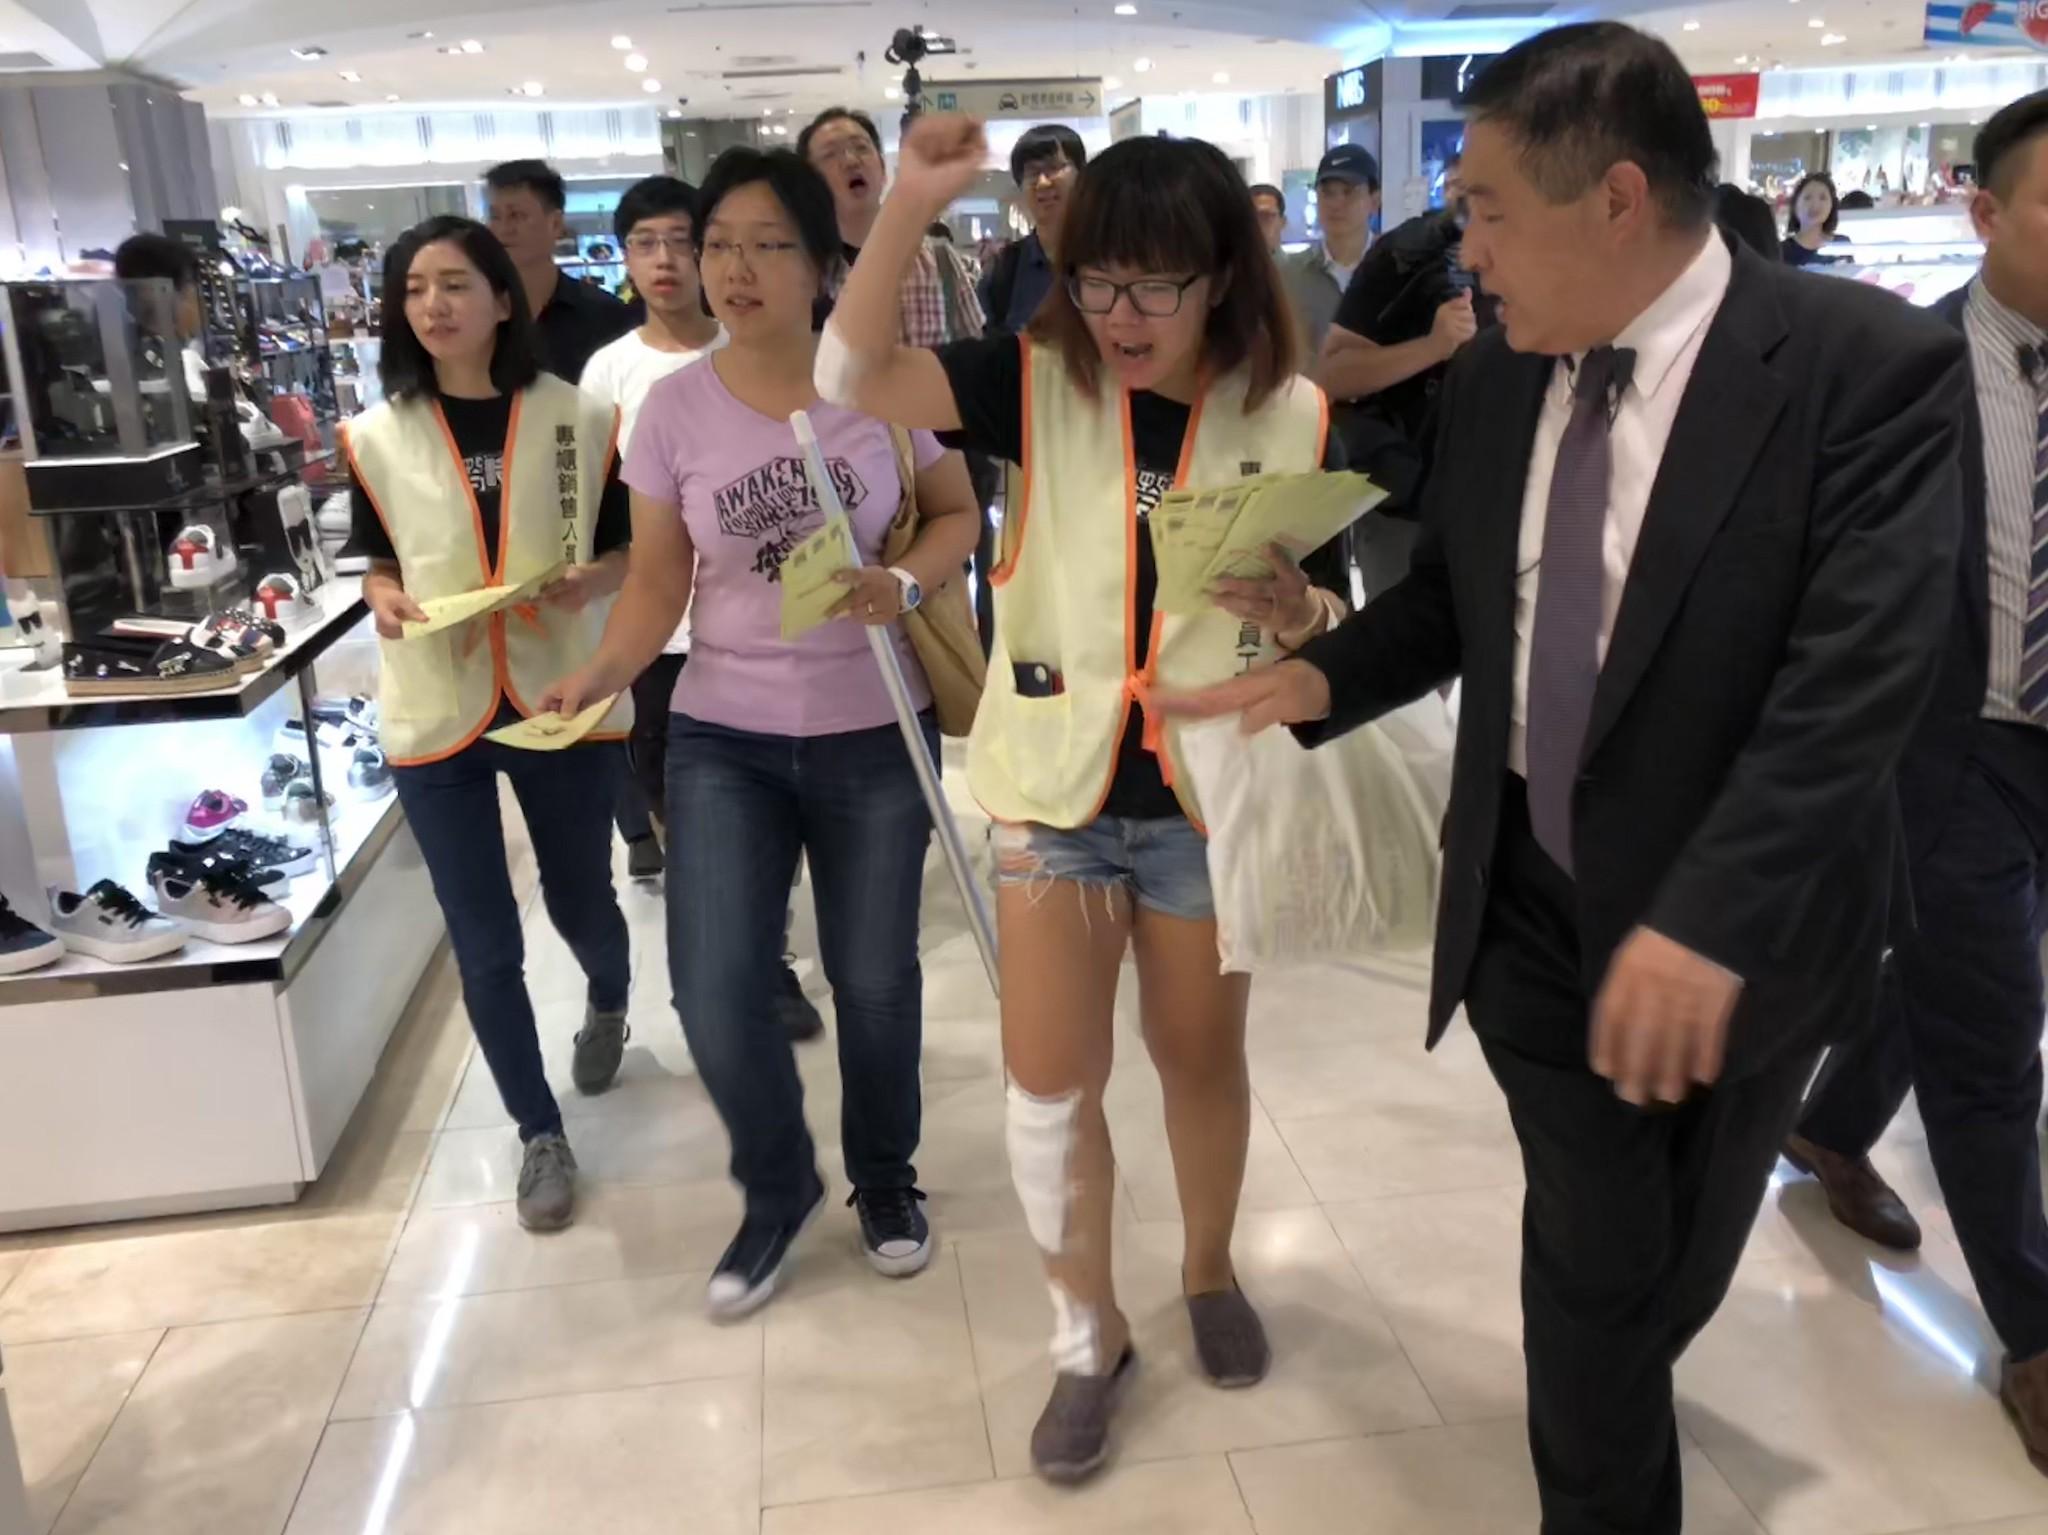 SOGO保全與管理幹部沿途提醒工會「尊重顧客的消費權」。(攝影:王顥中)